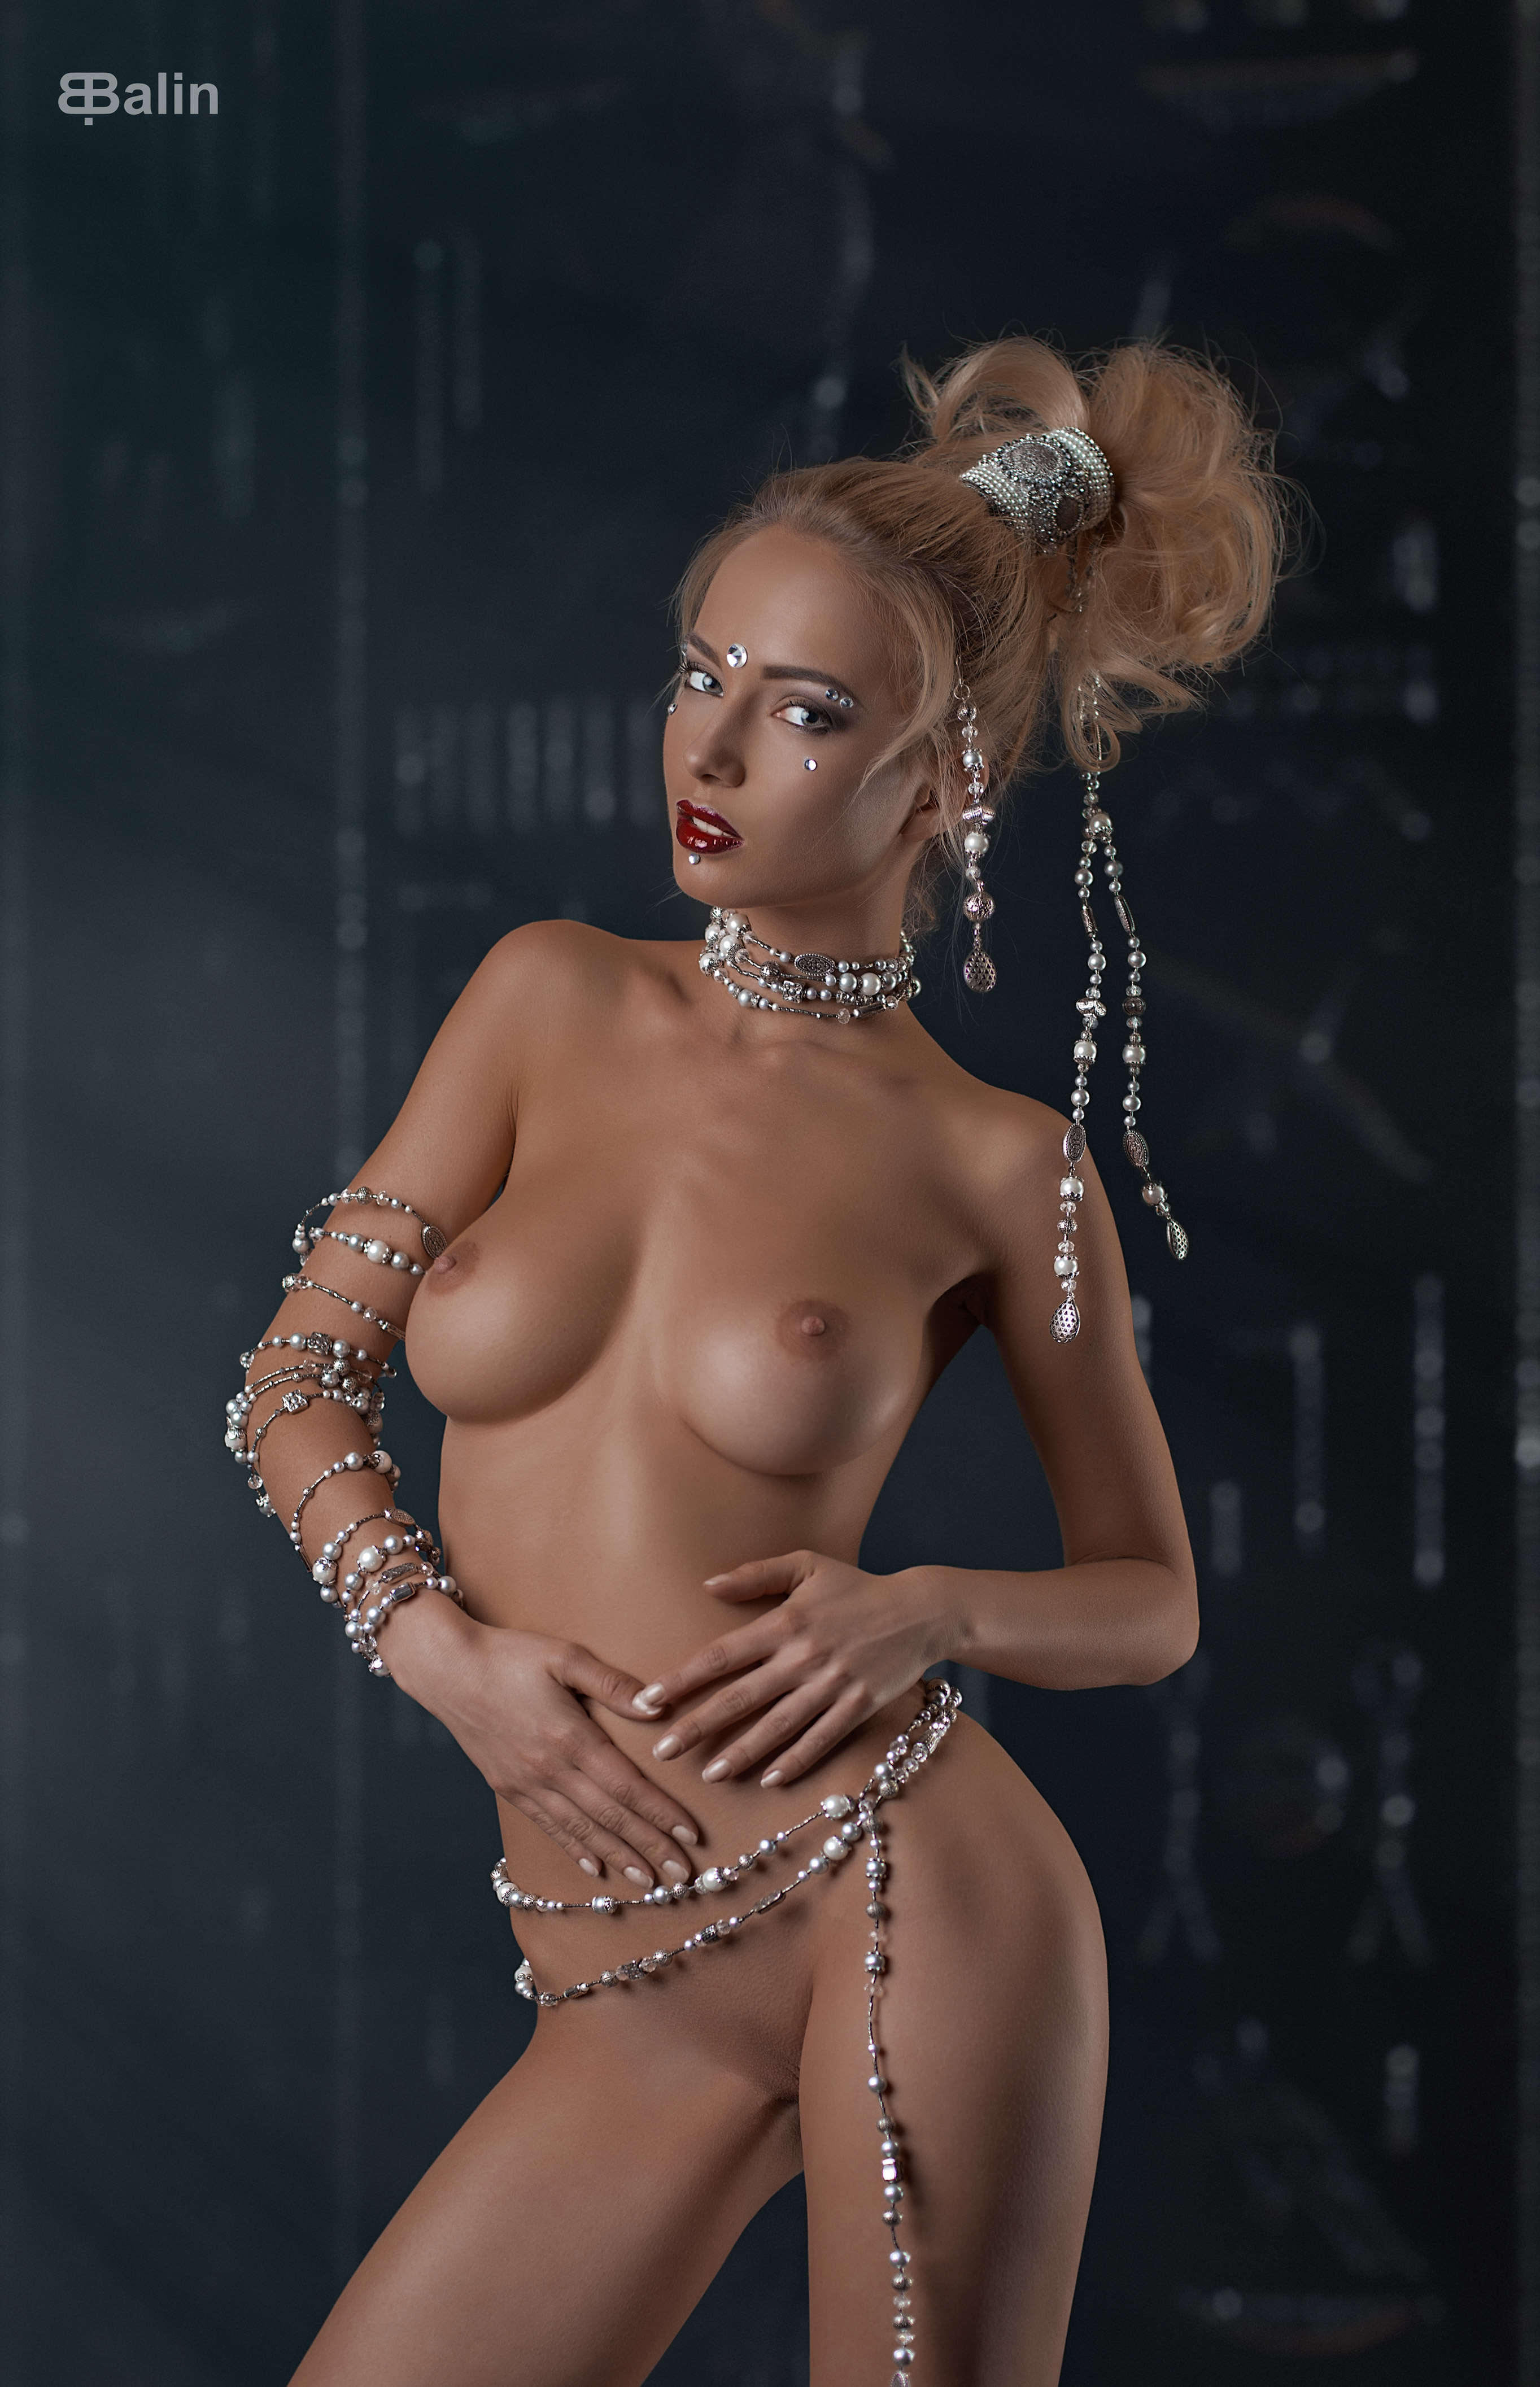 голая Наталья Андреева / Natalya Andreeva nude by E.Balin